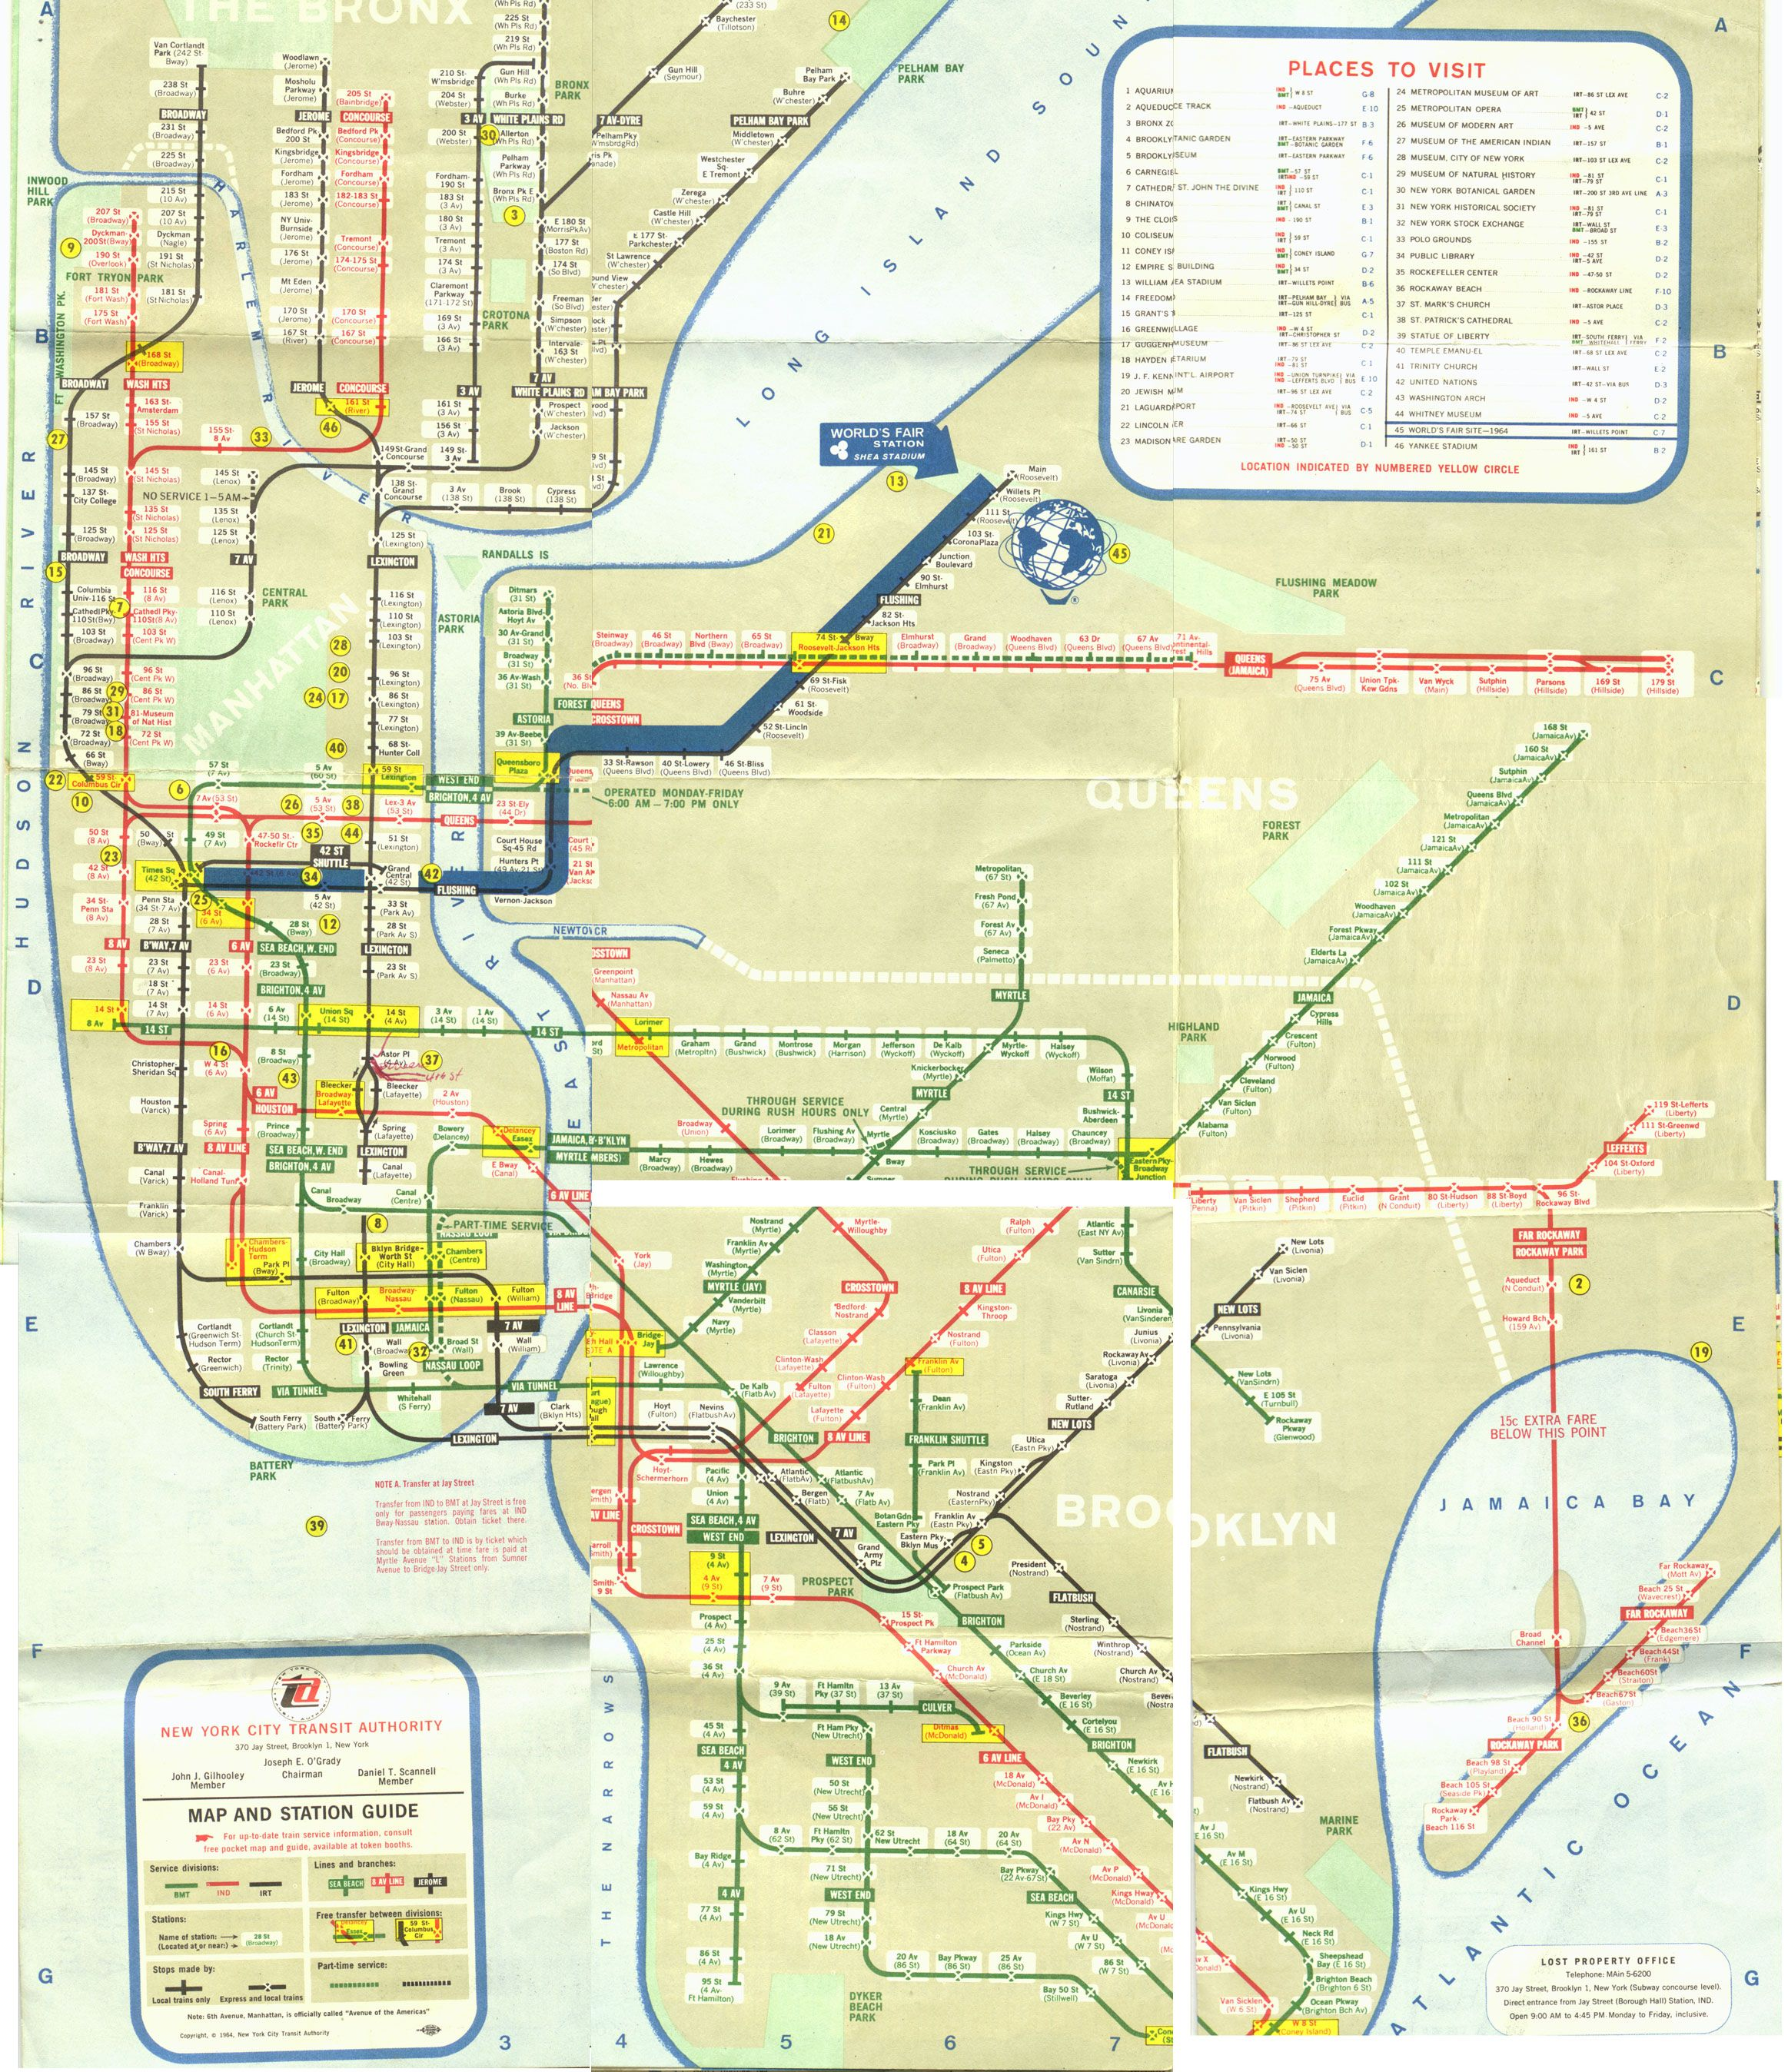 Vintage New York City Subway Map.1964 World S Fair New York City Subway Subwaymap Nycsubway